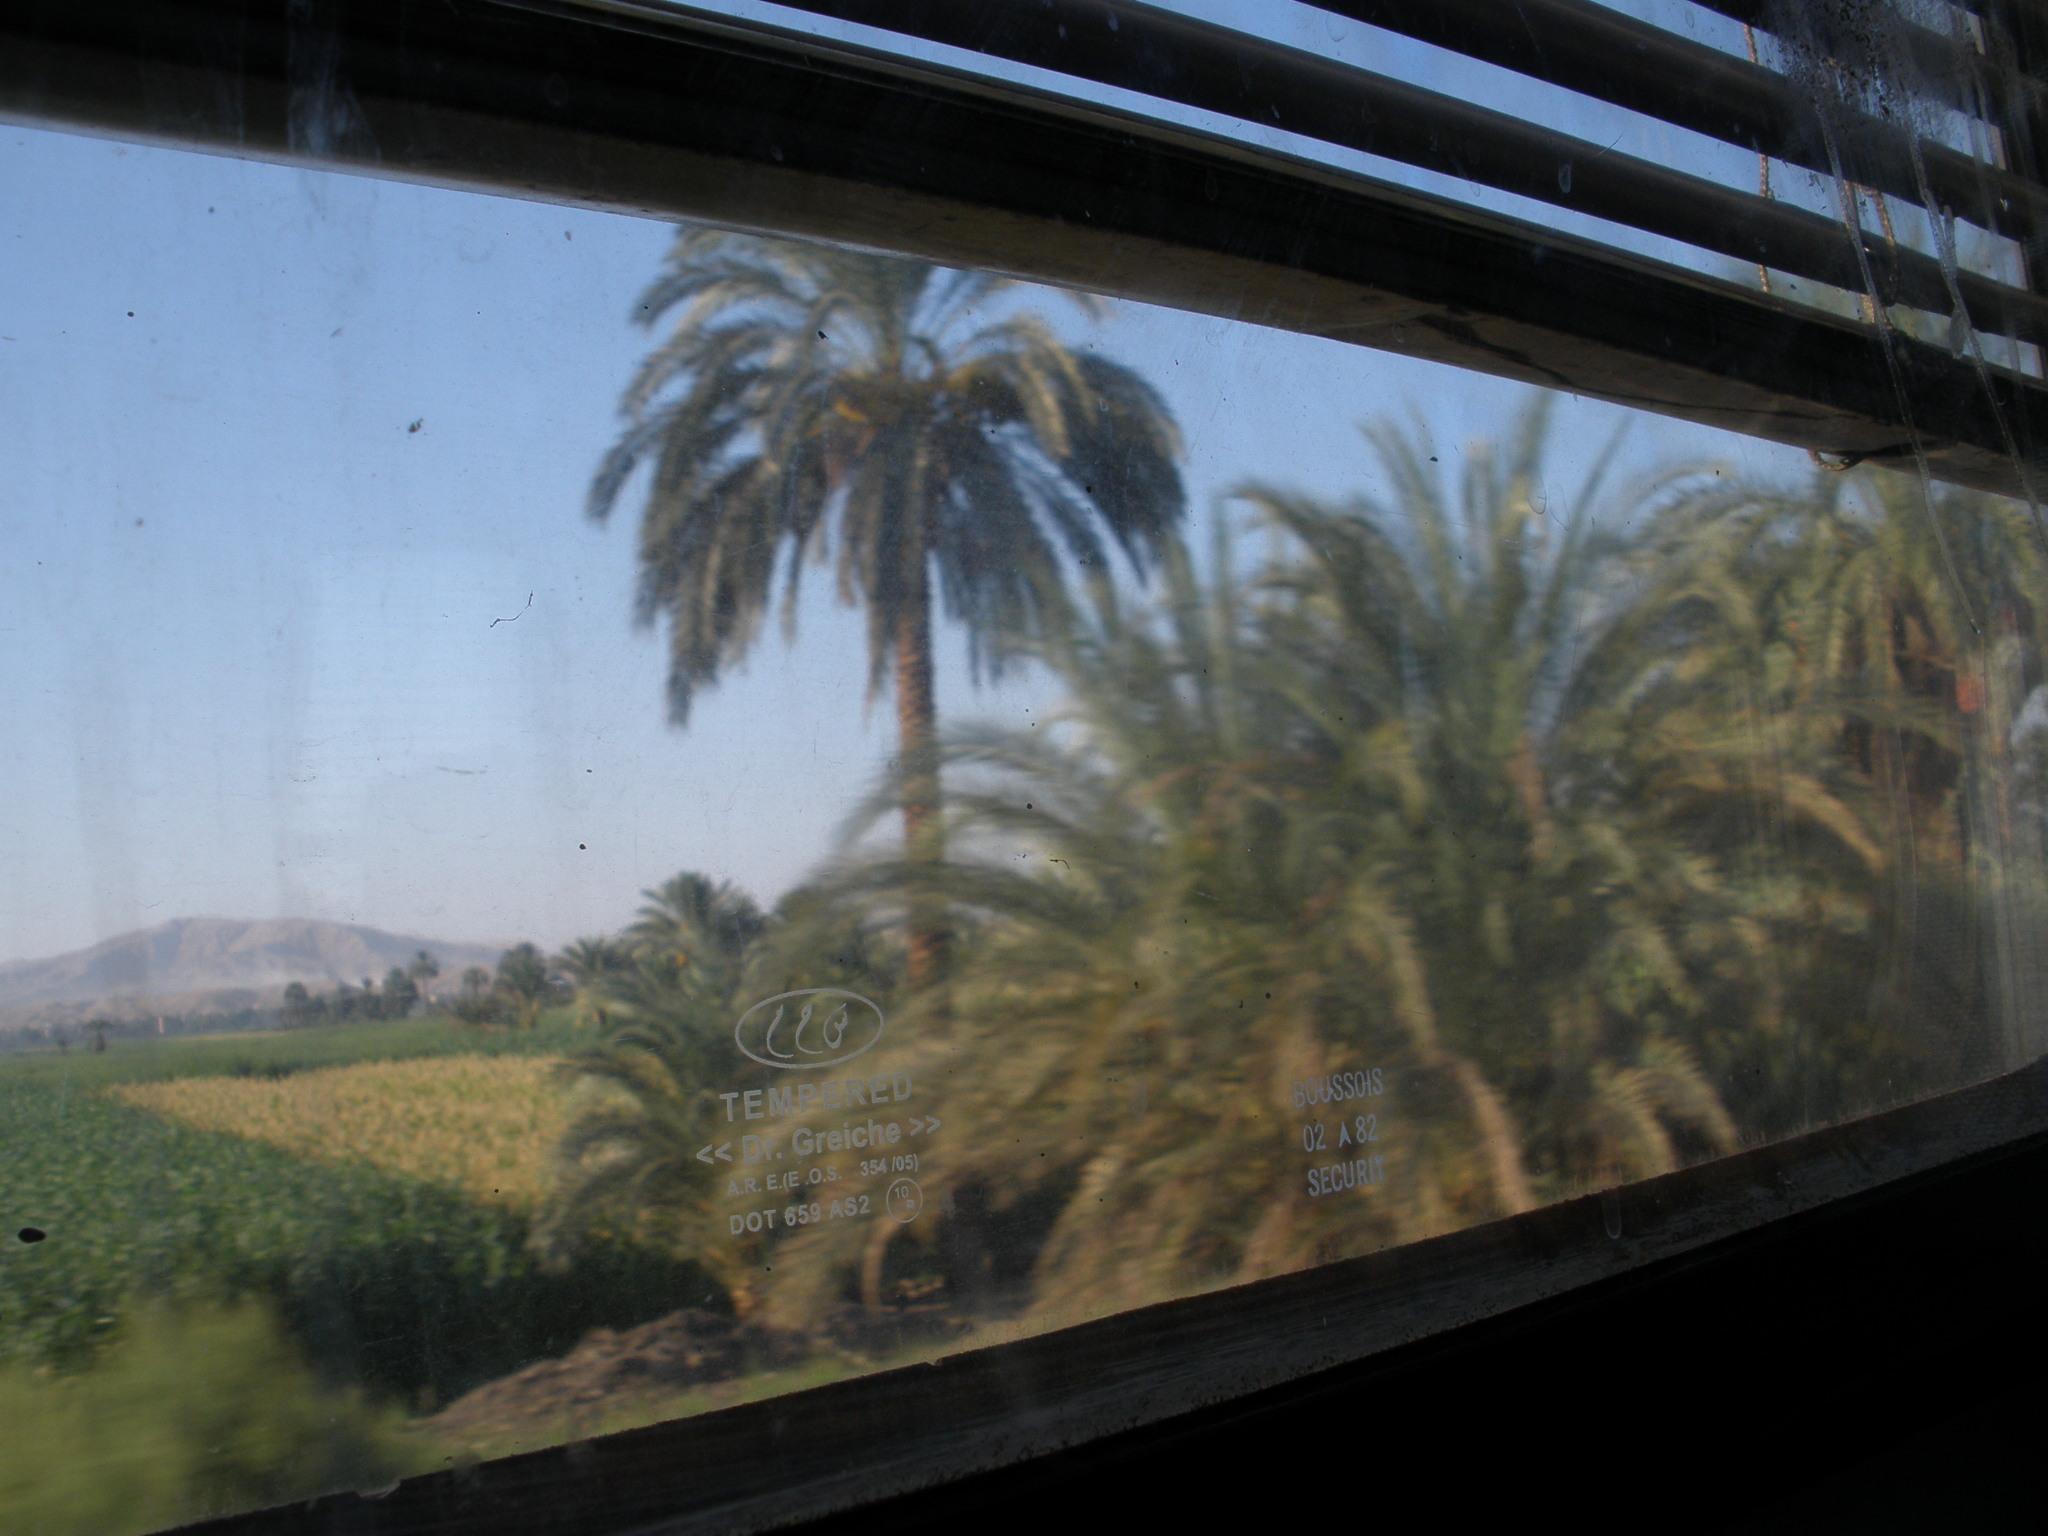 En tren de Luxor a Aswan